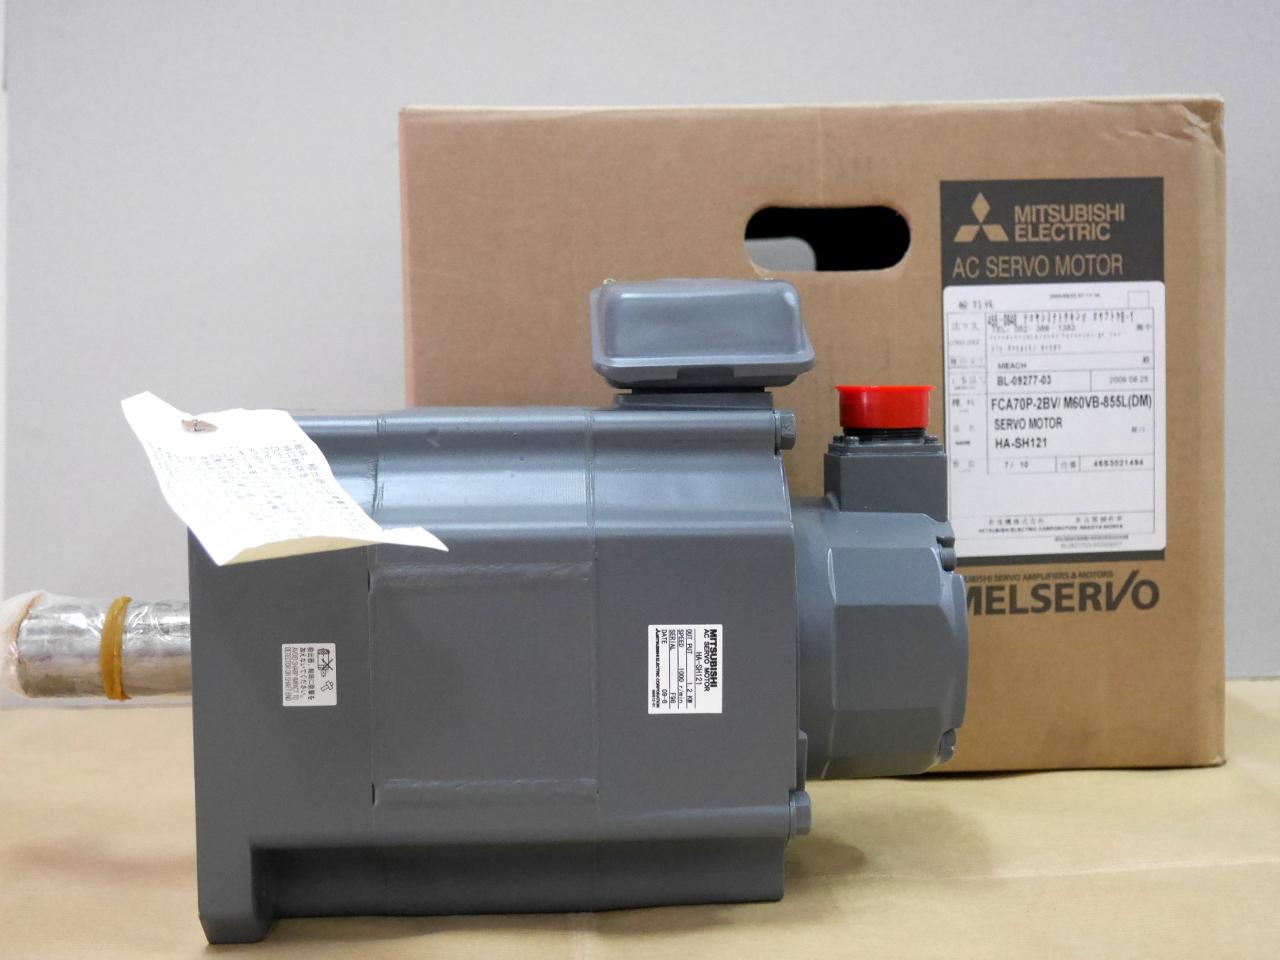 Mitsubishi Ac Servo Motor Ha Sh121 Ebay